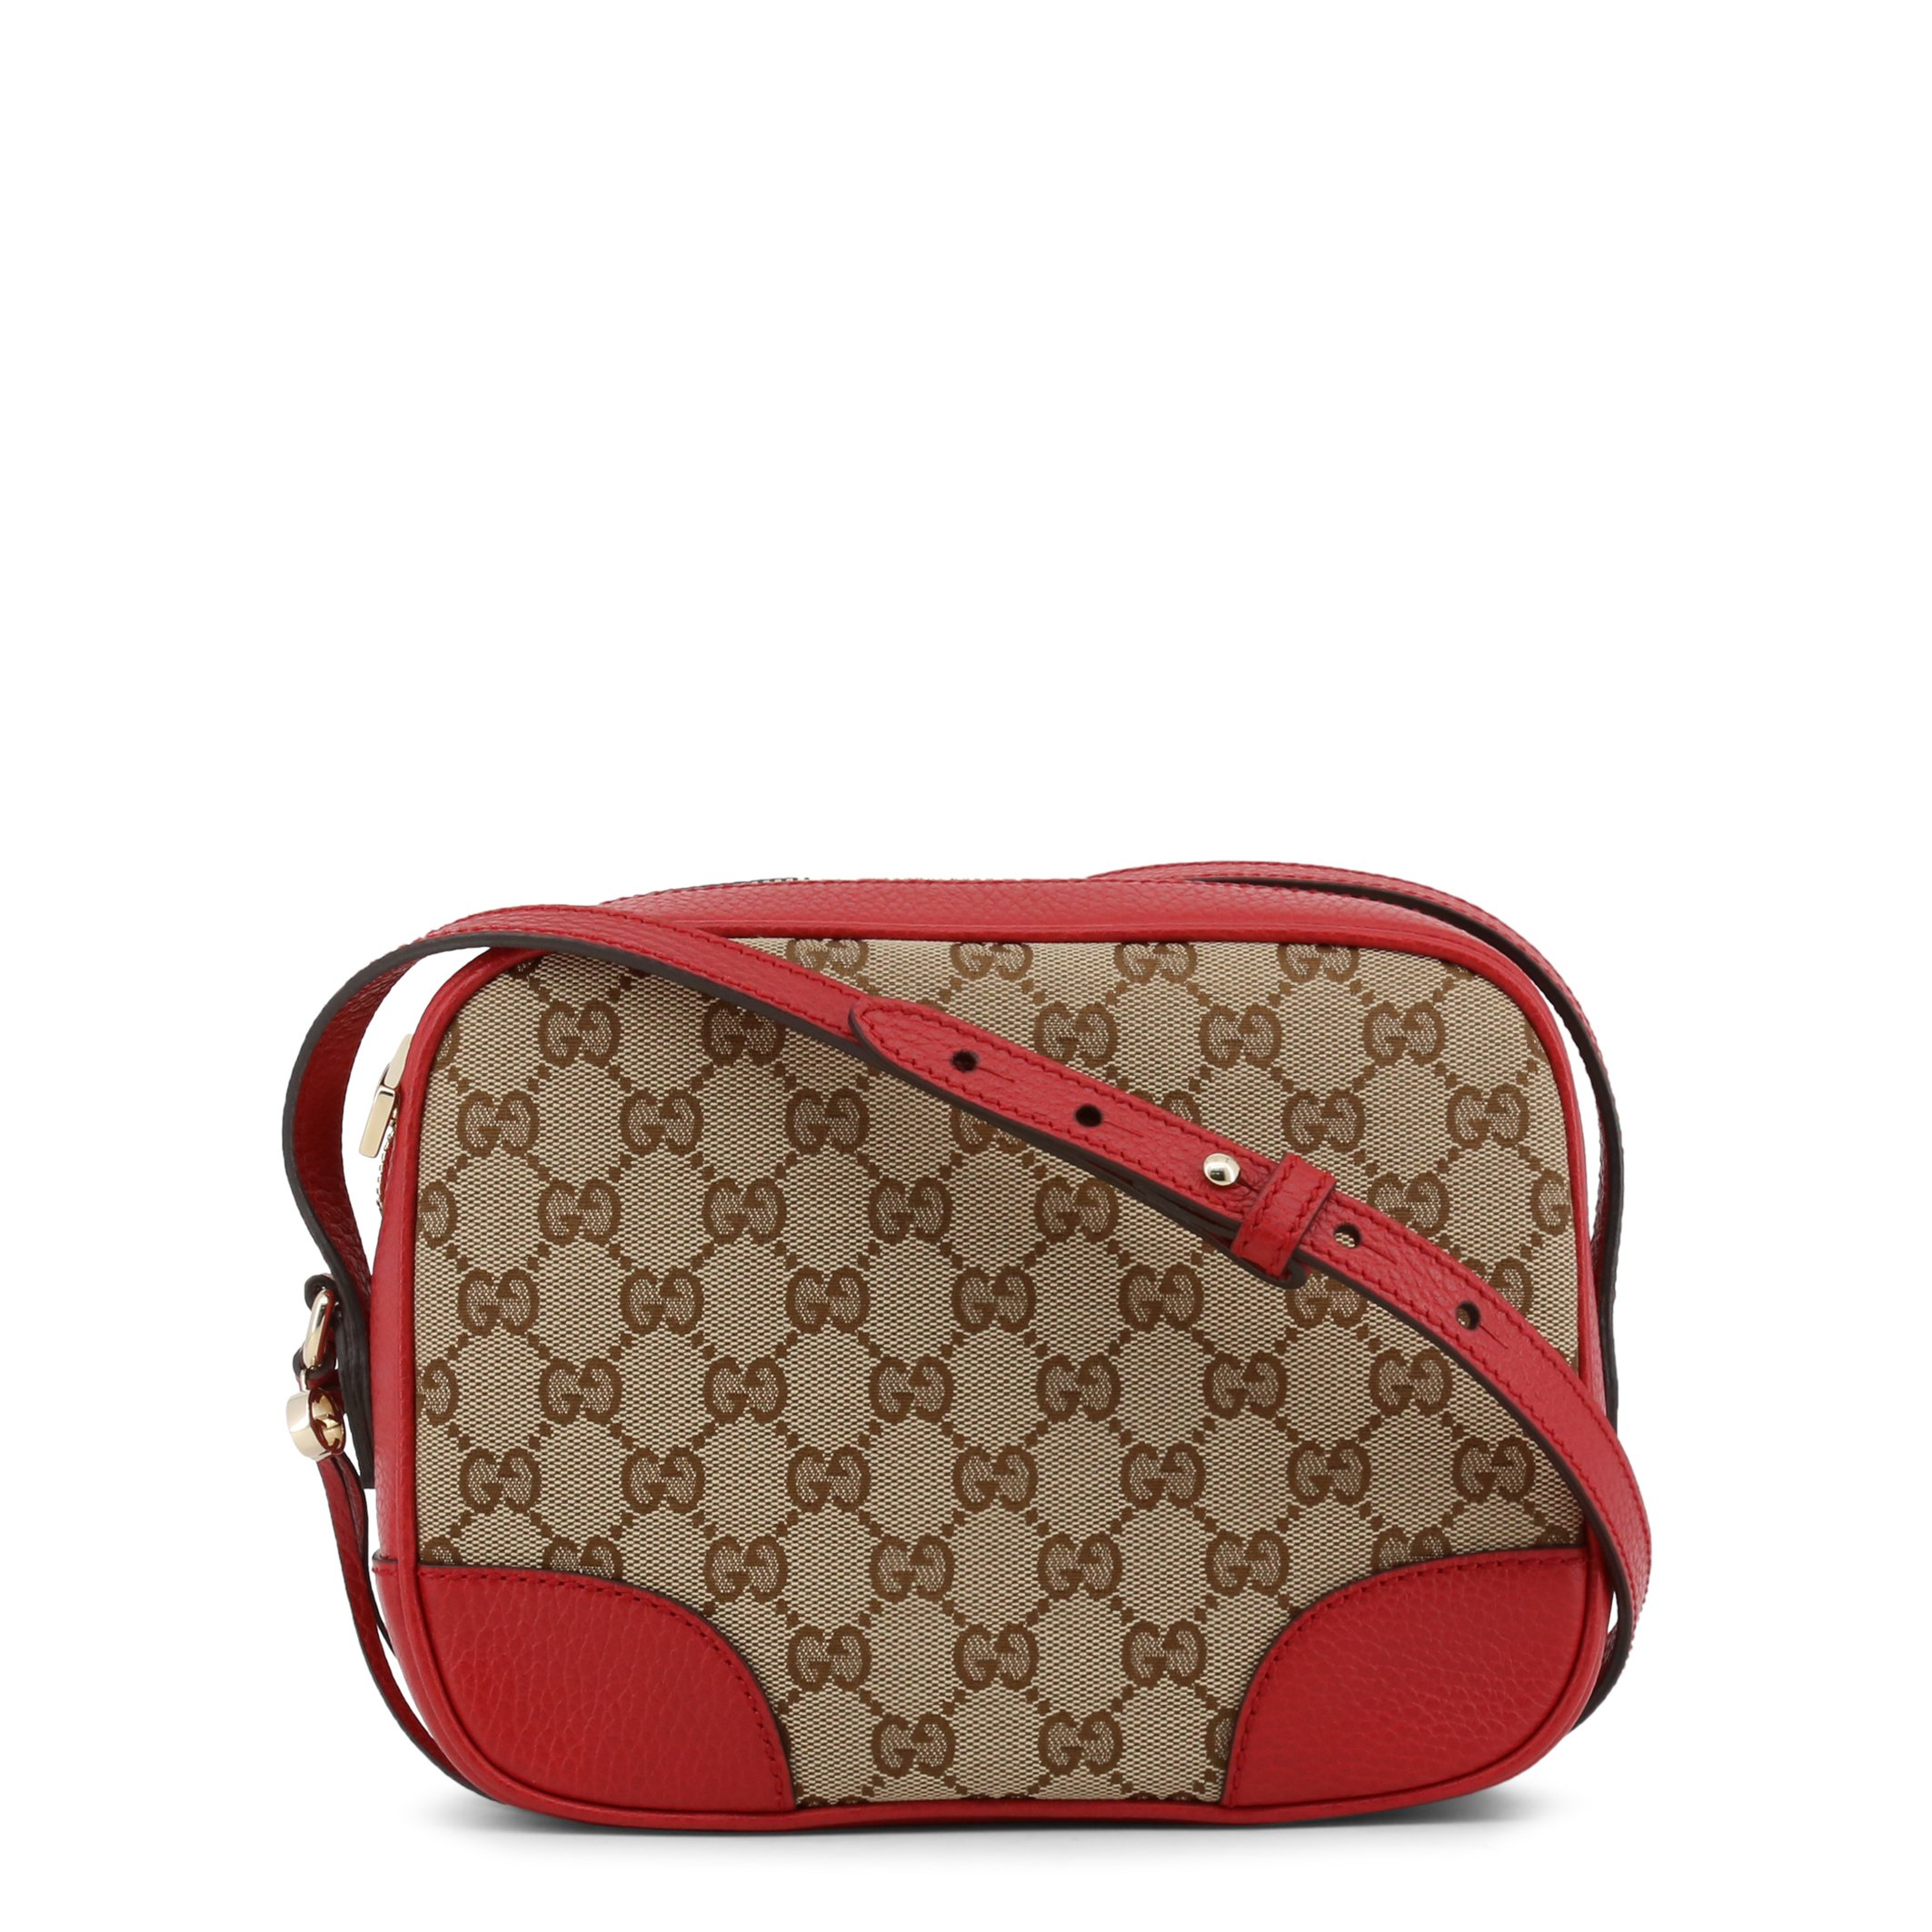 Gucci Women's Crossbody Bag Brown 325995 - brown-1 NOSIZE